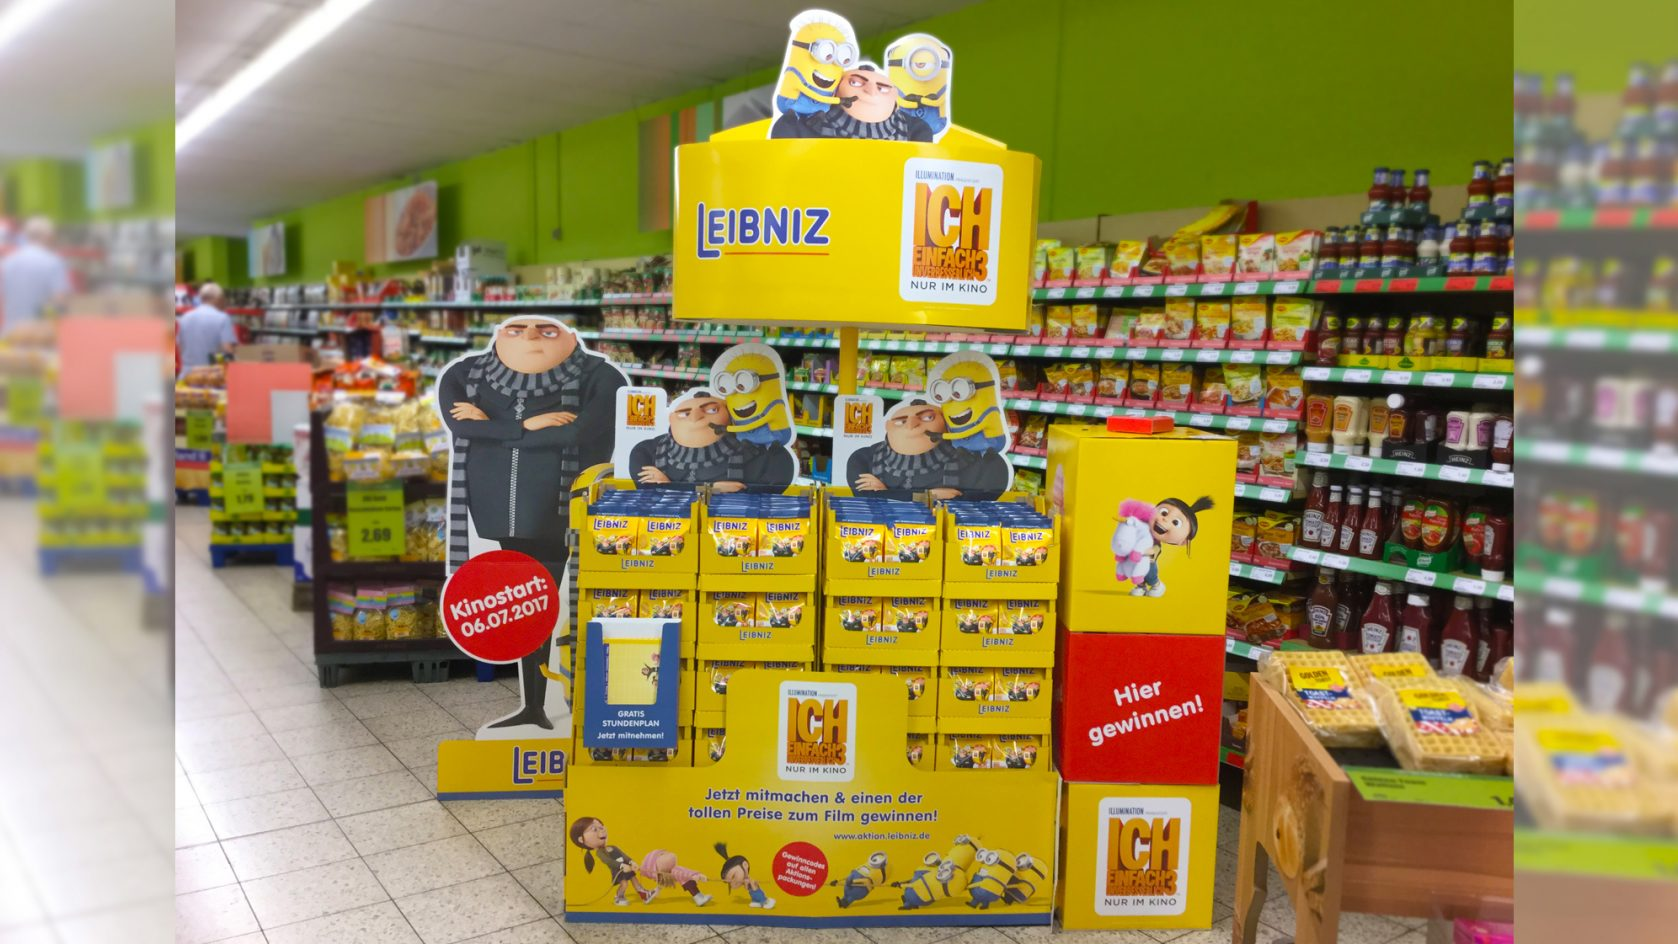 Leibniz Minions am POS